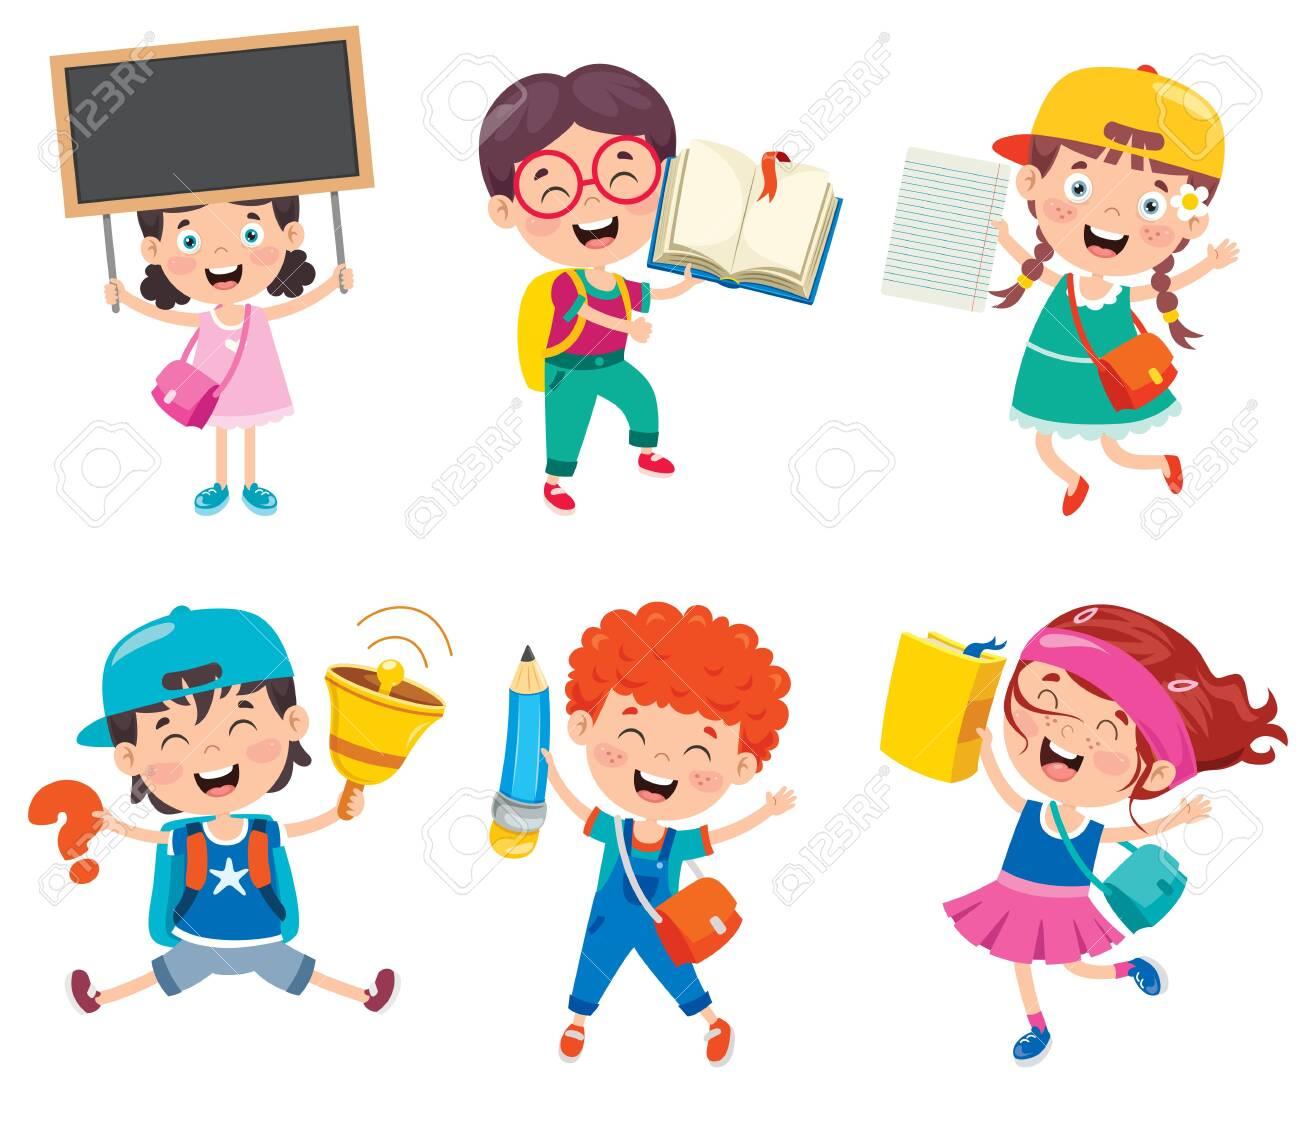 Happy Cute Cartoon School Children - 148055459